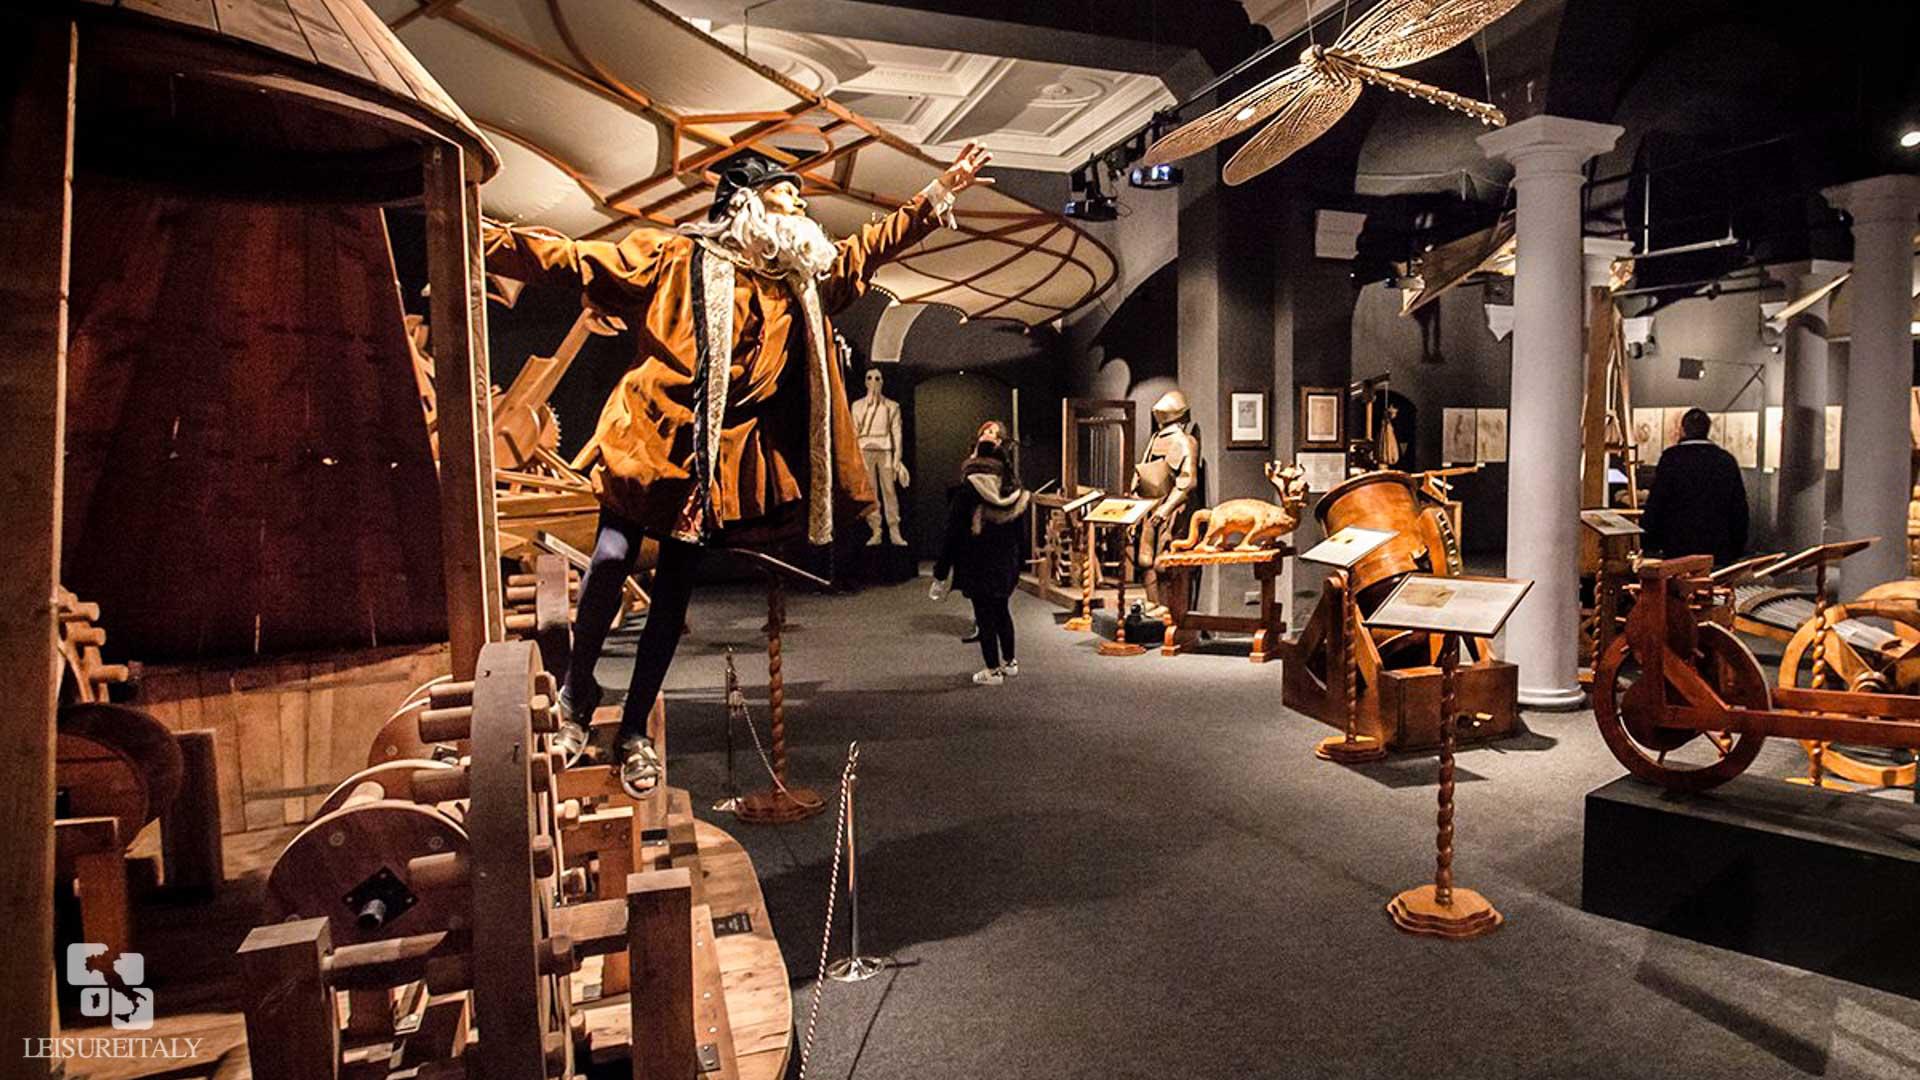 Leonardo Da Vinci Museum In The Heart Of Florence